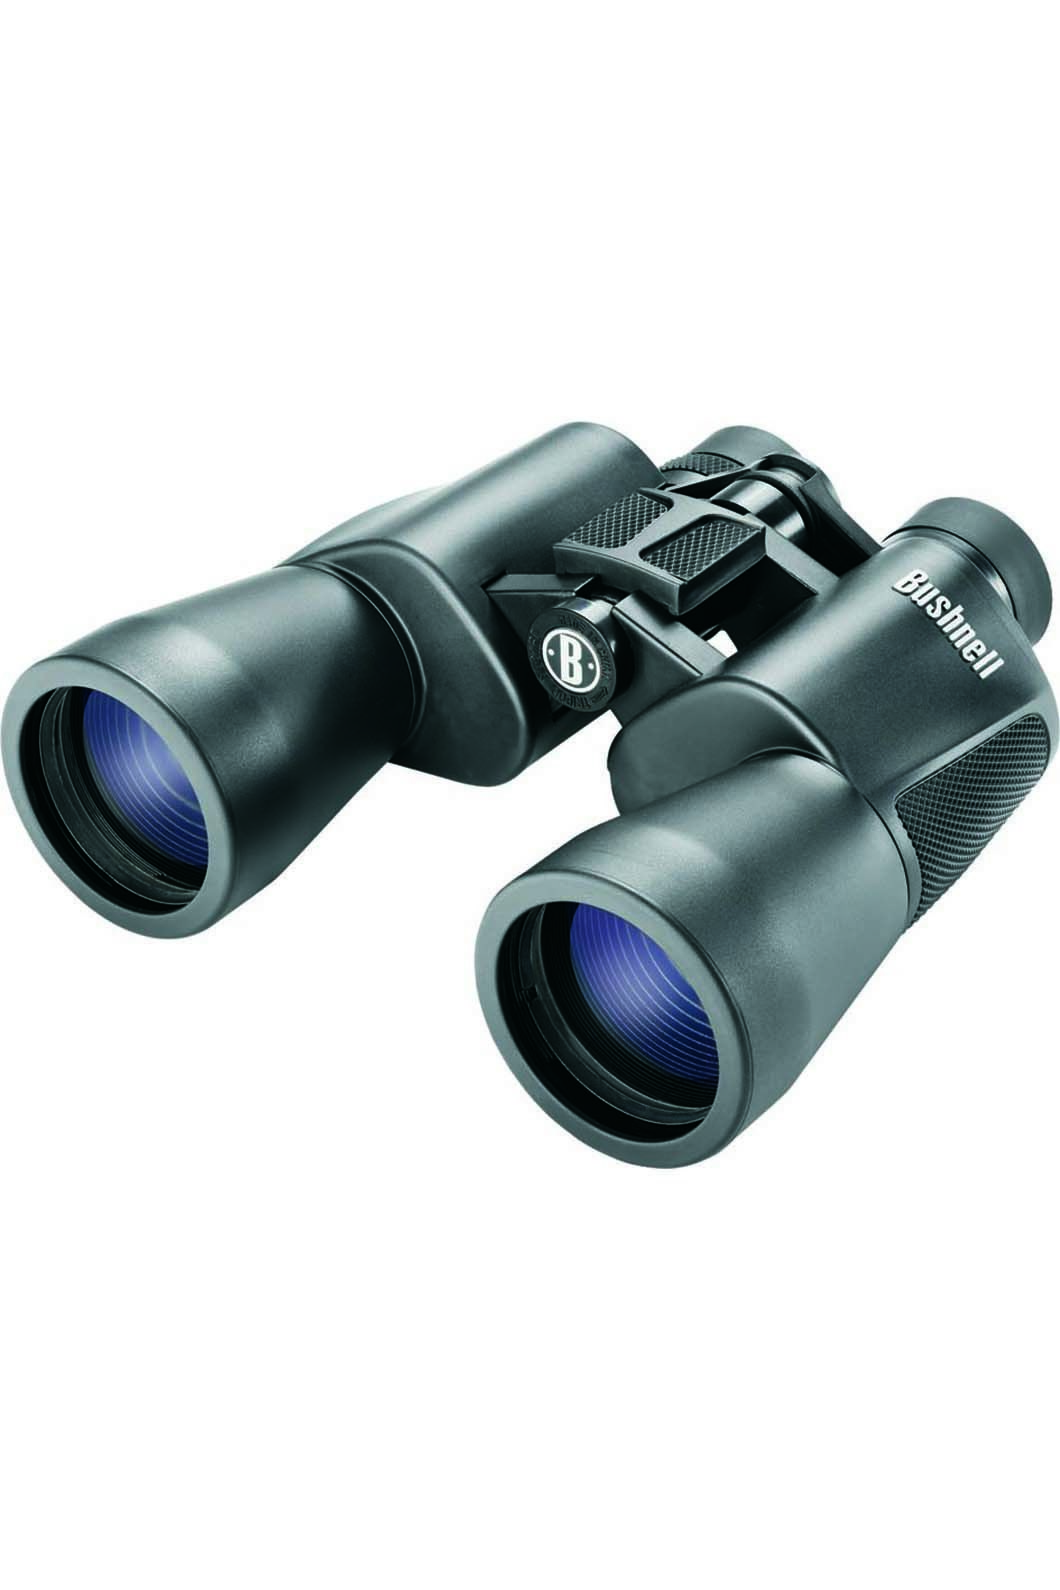 Bushnell 10 x 50 Powerview Binoculars, None, hi-res